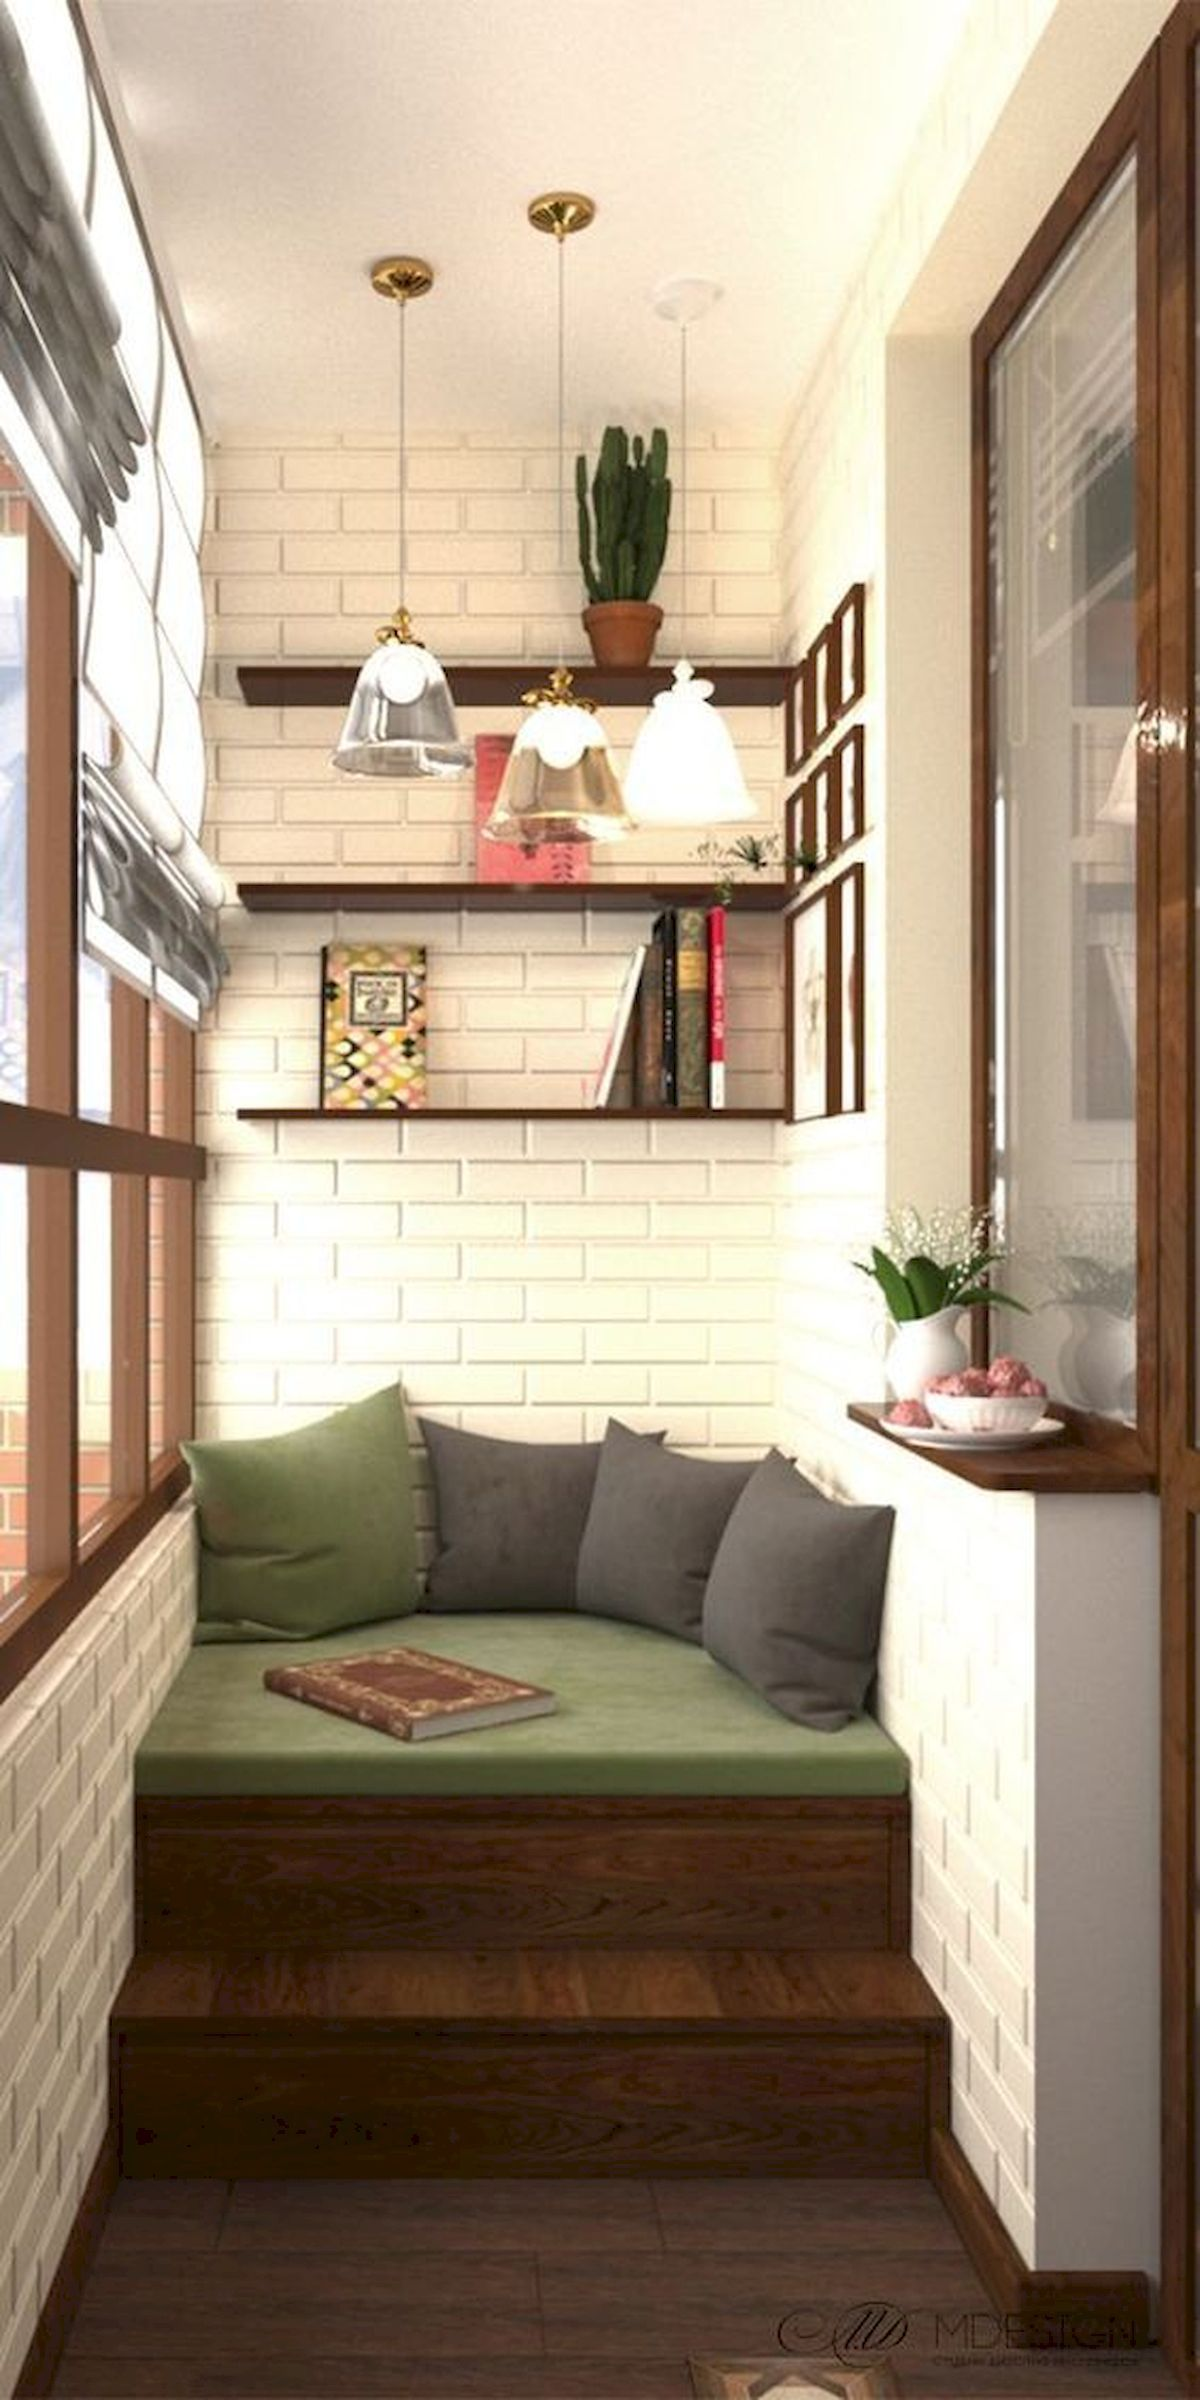 60 Best Window Seat Design Ideas (12) - Googodecor